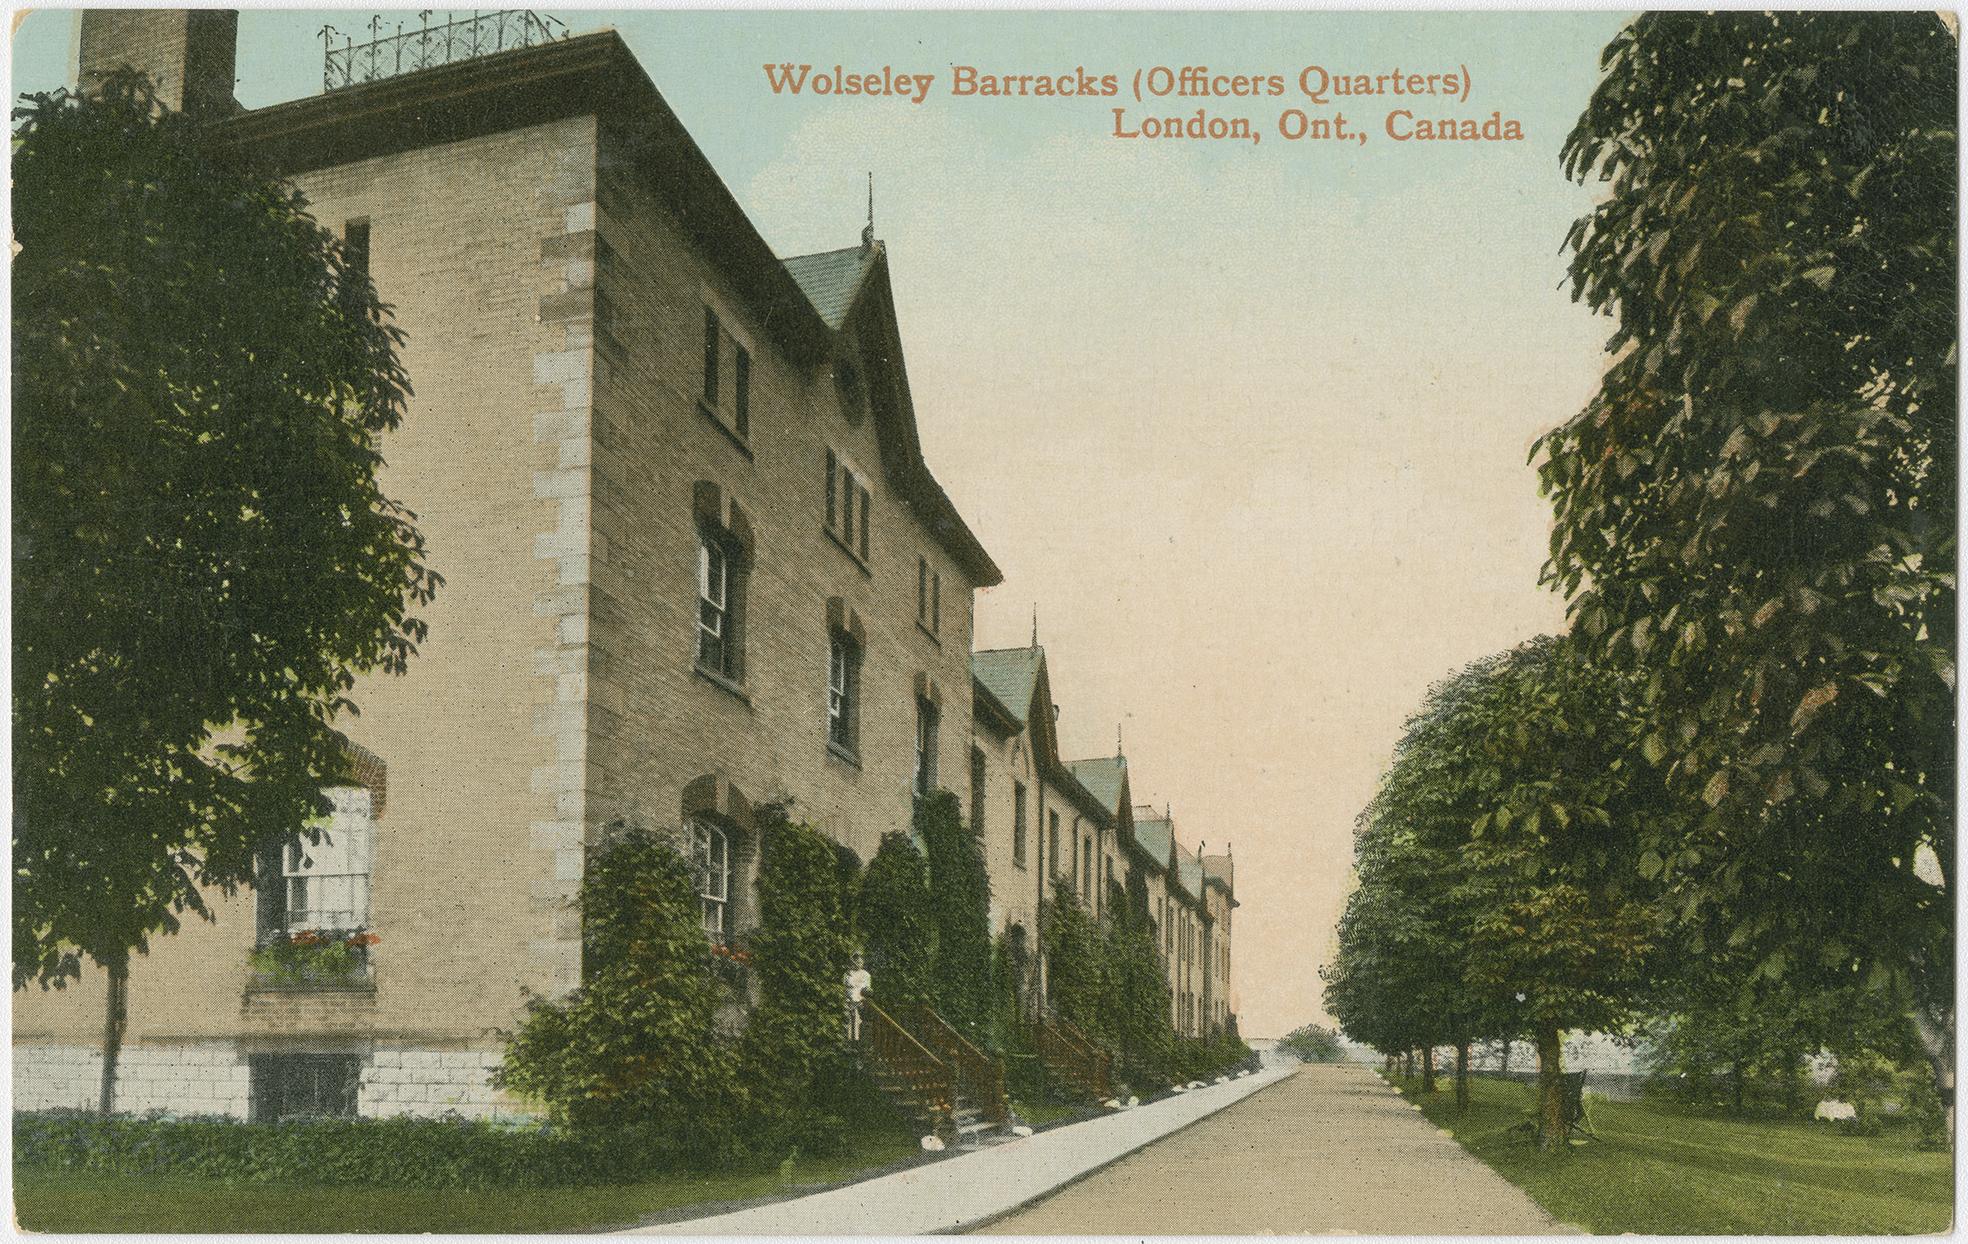 Wolseley Barracks, Officers Quarters